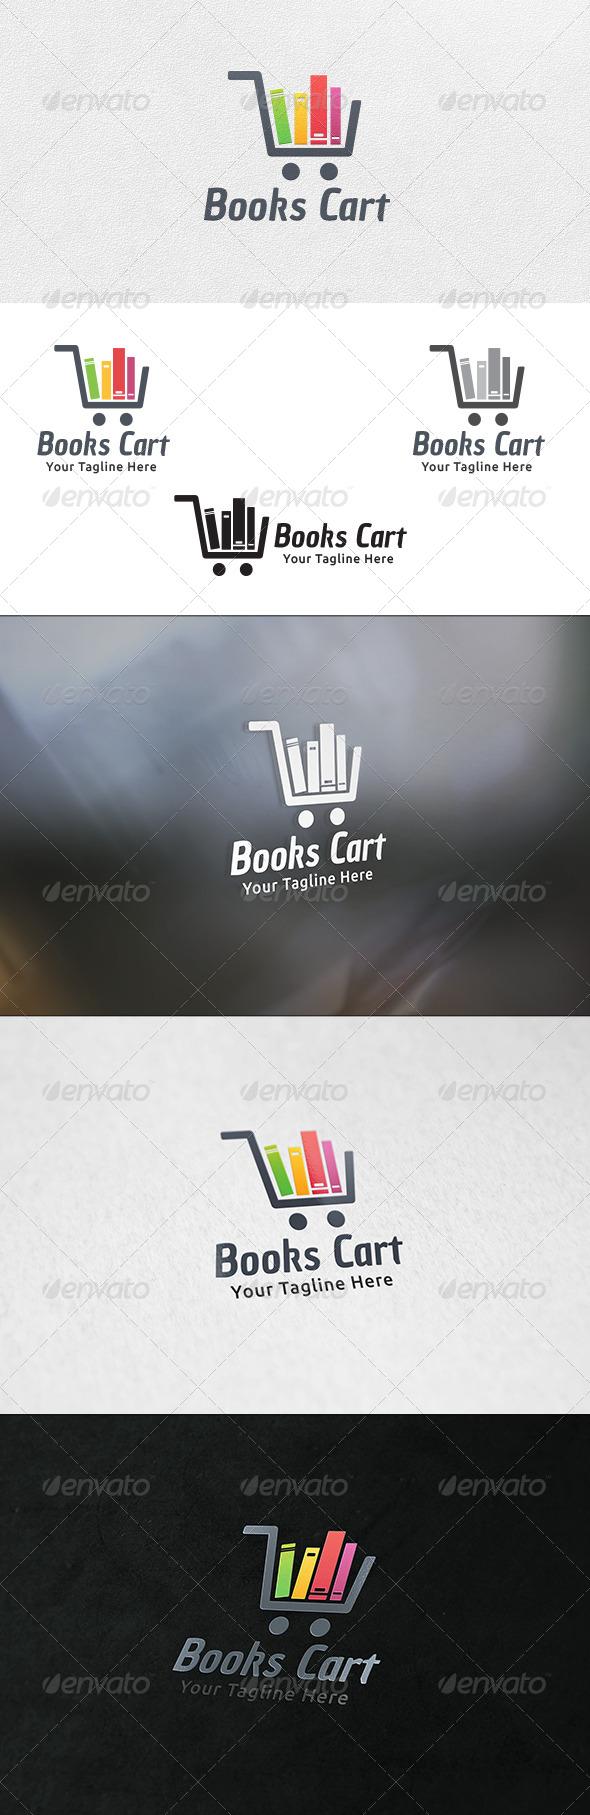 GraphicRiver Books Cart Logo Template 6550127